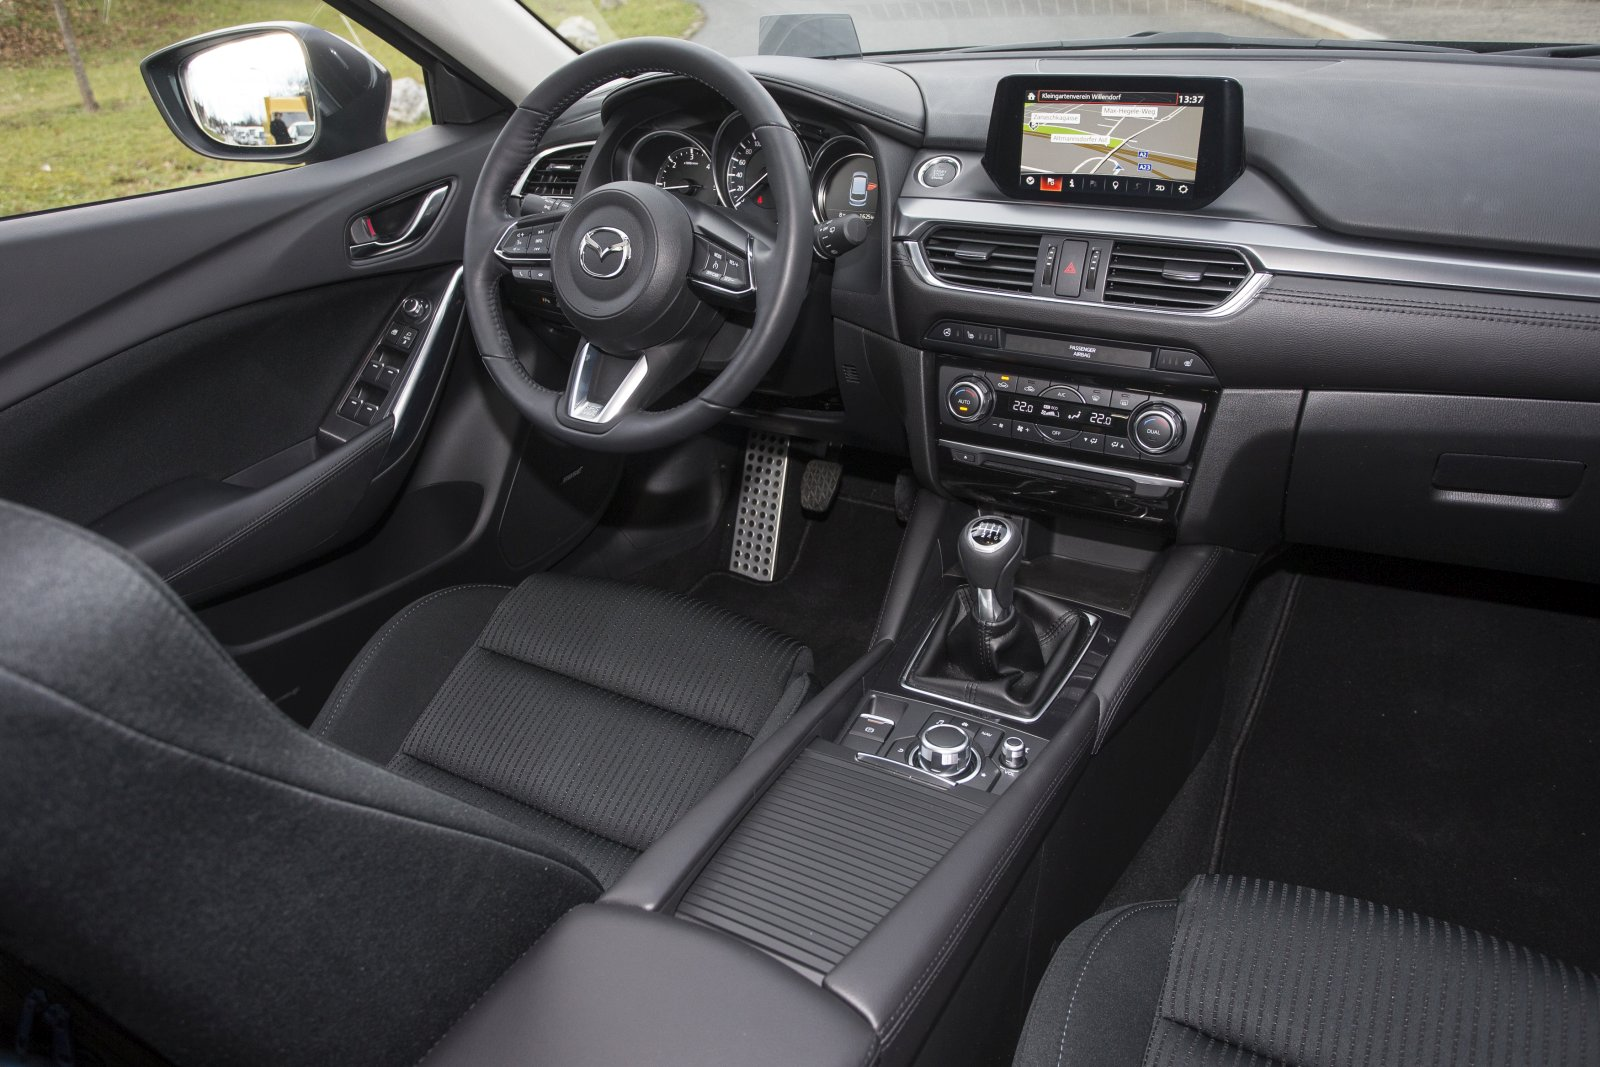 test mazda6 sport combi cd 150 revolution alles auto. Black Bedroom Furniture Sets. Home Design Ideas